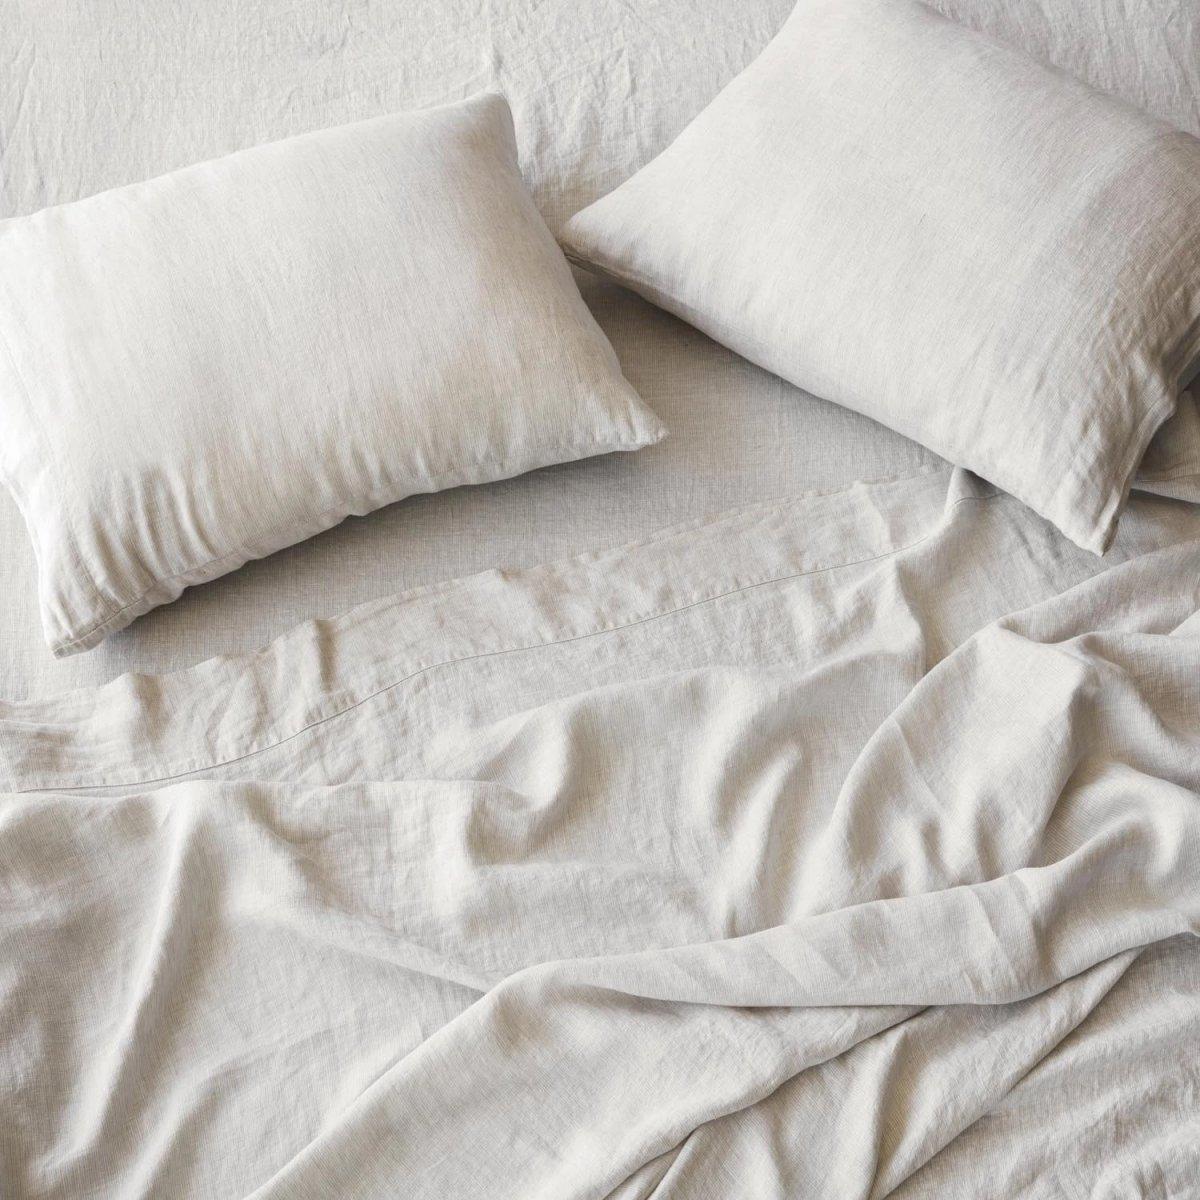 Stonewashed Linen Bed Bundle, sand stripe.